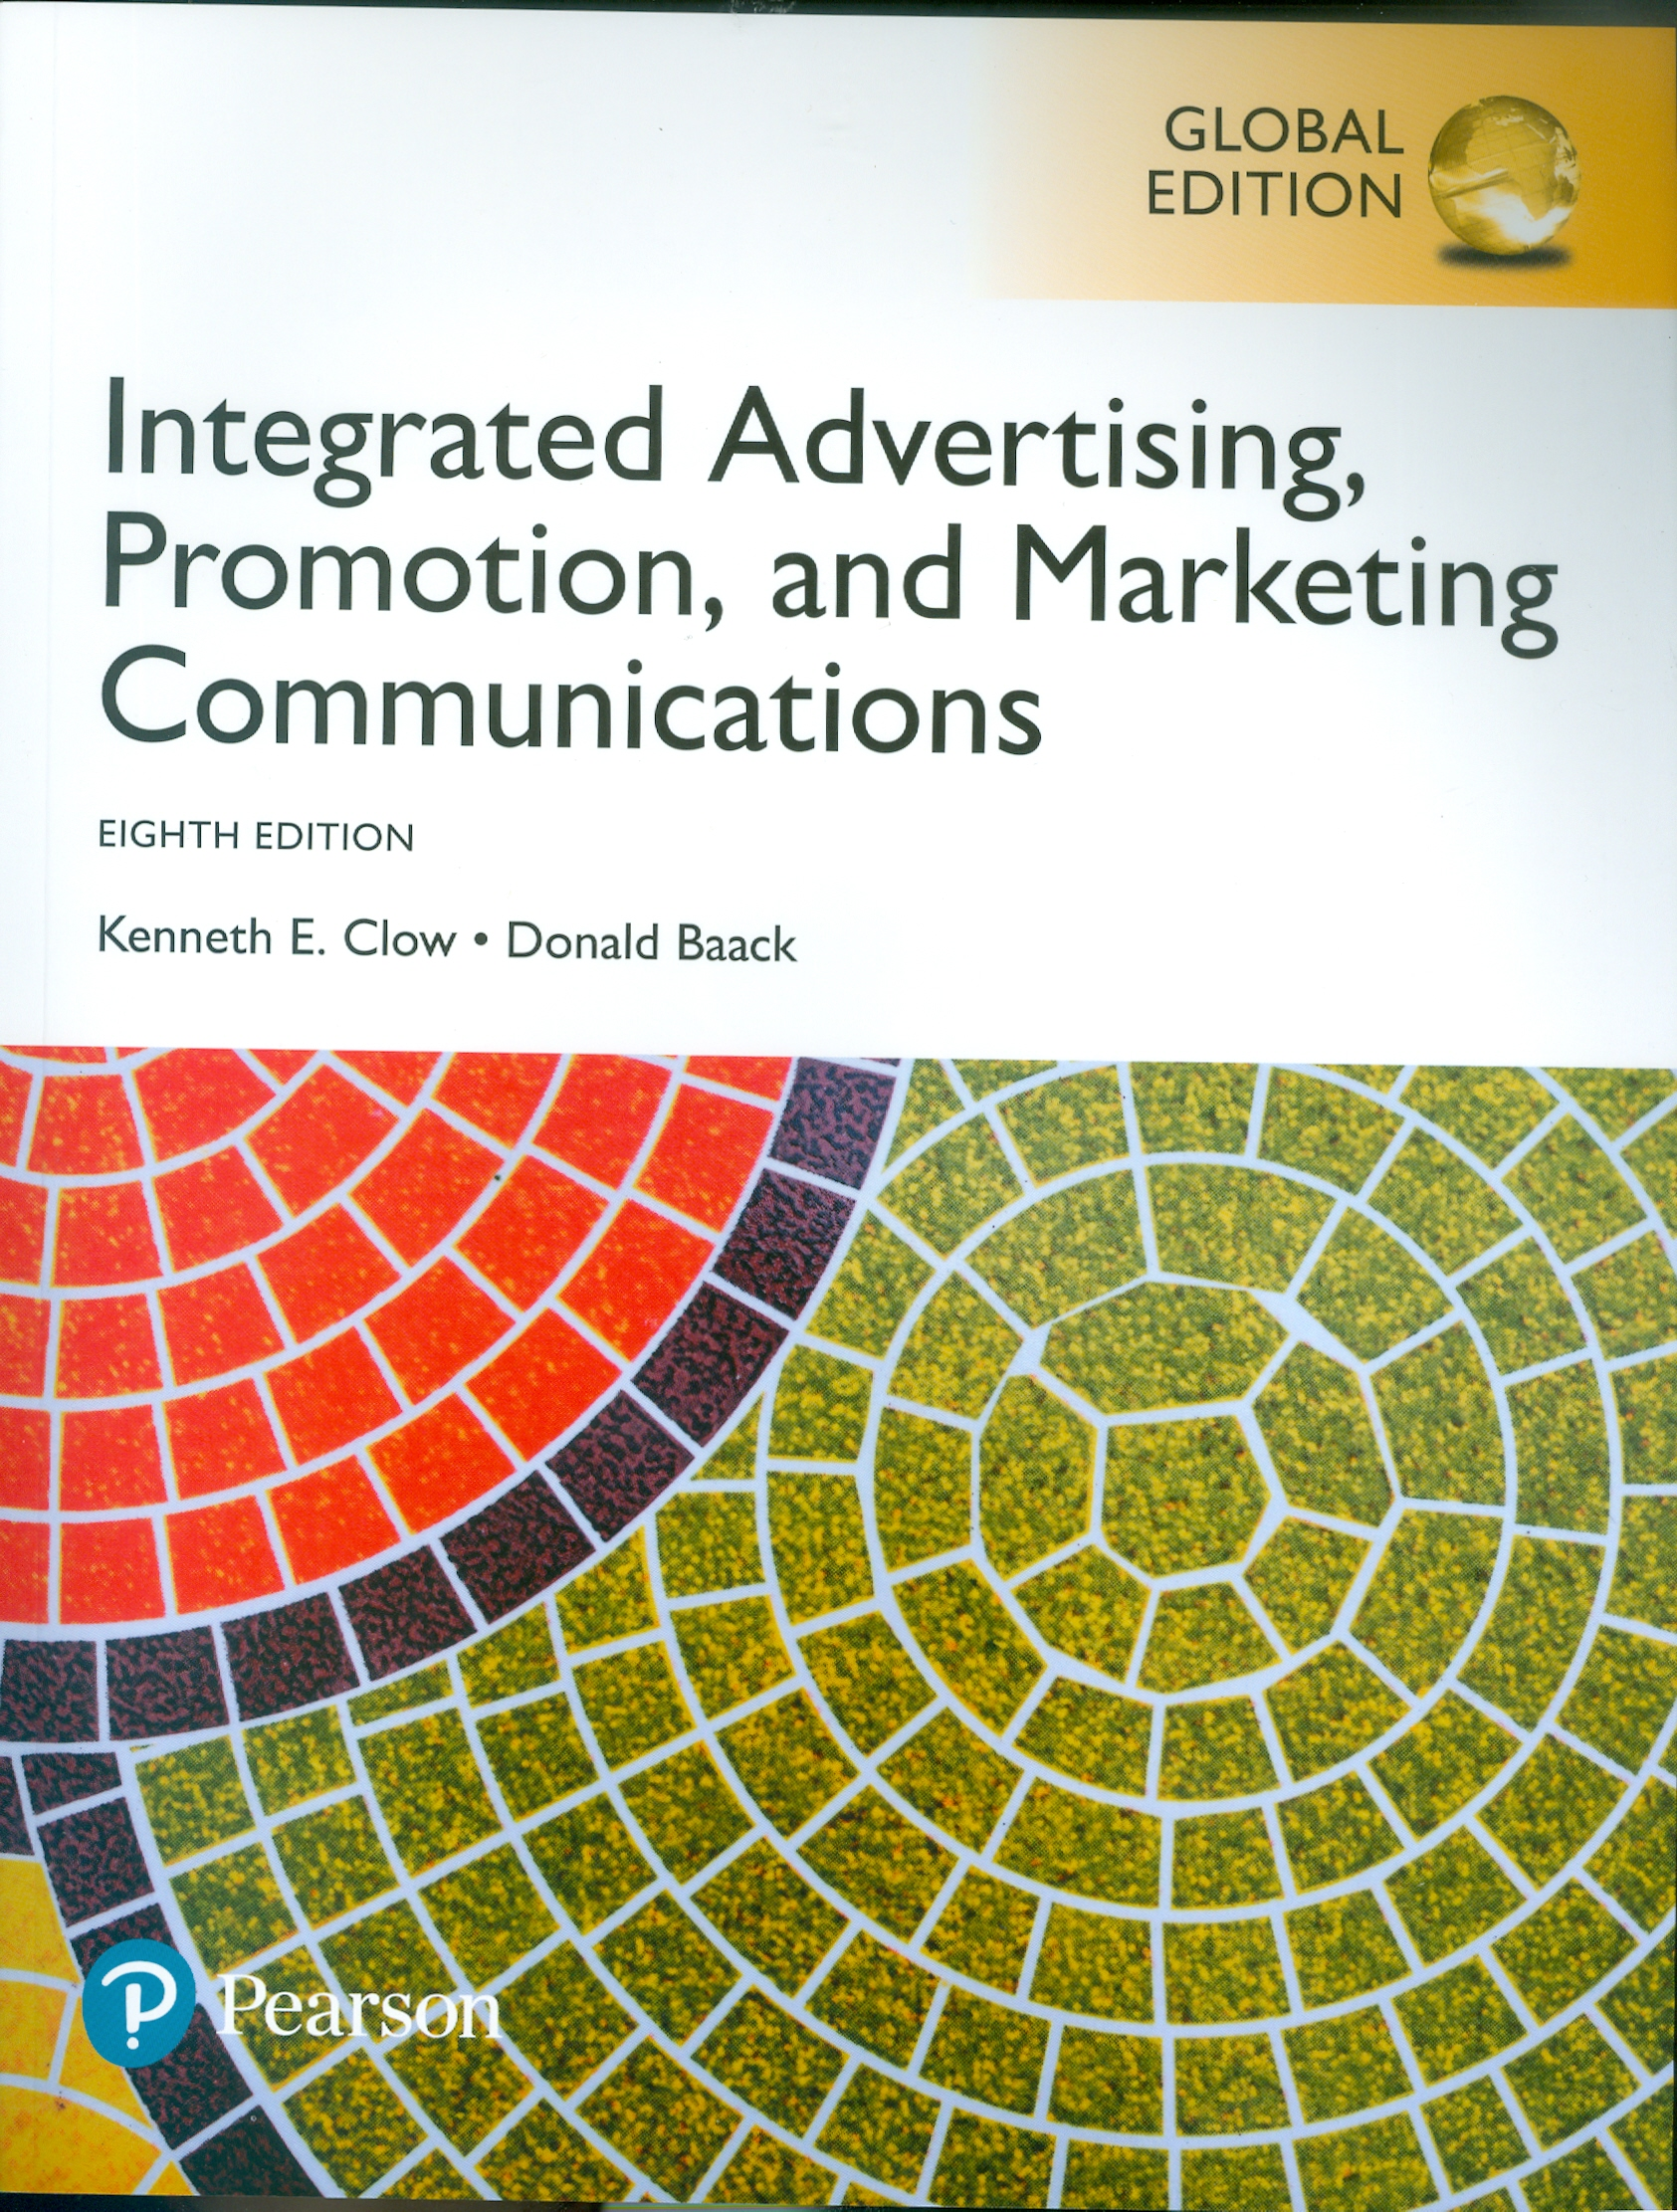 intergrated advertising0001.jpg